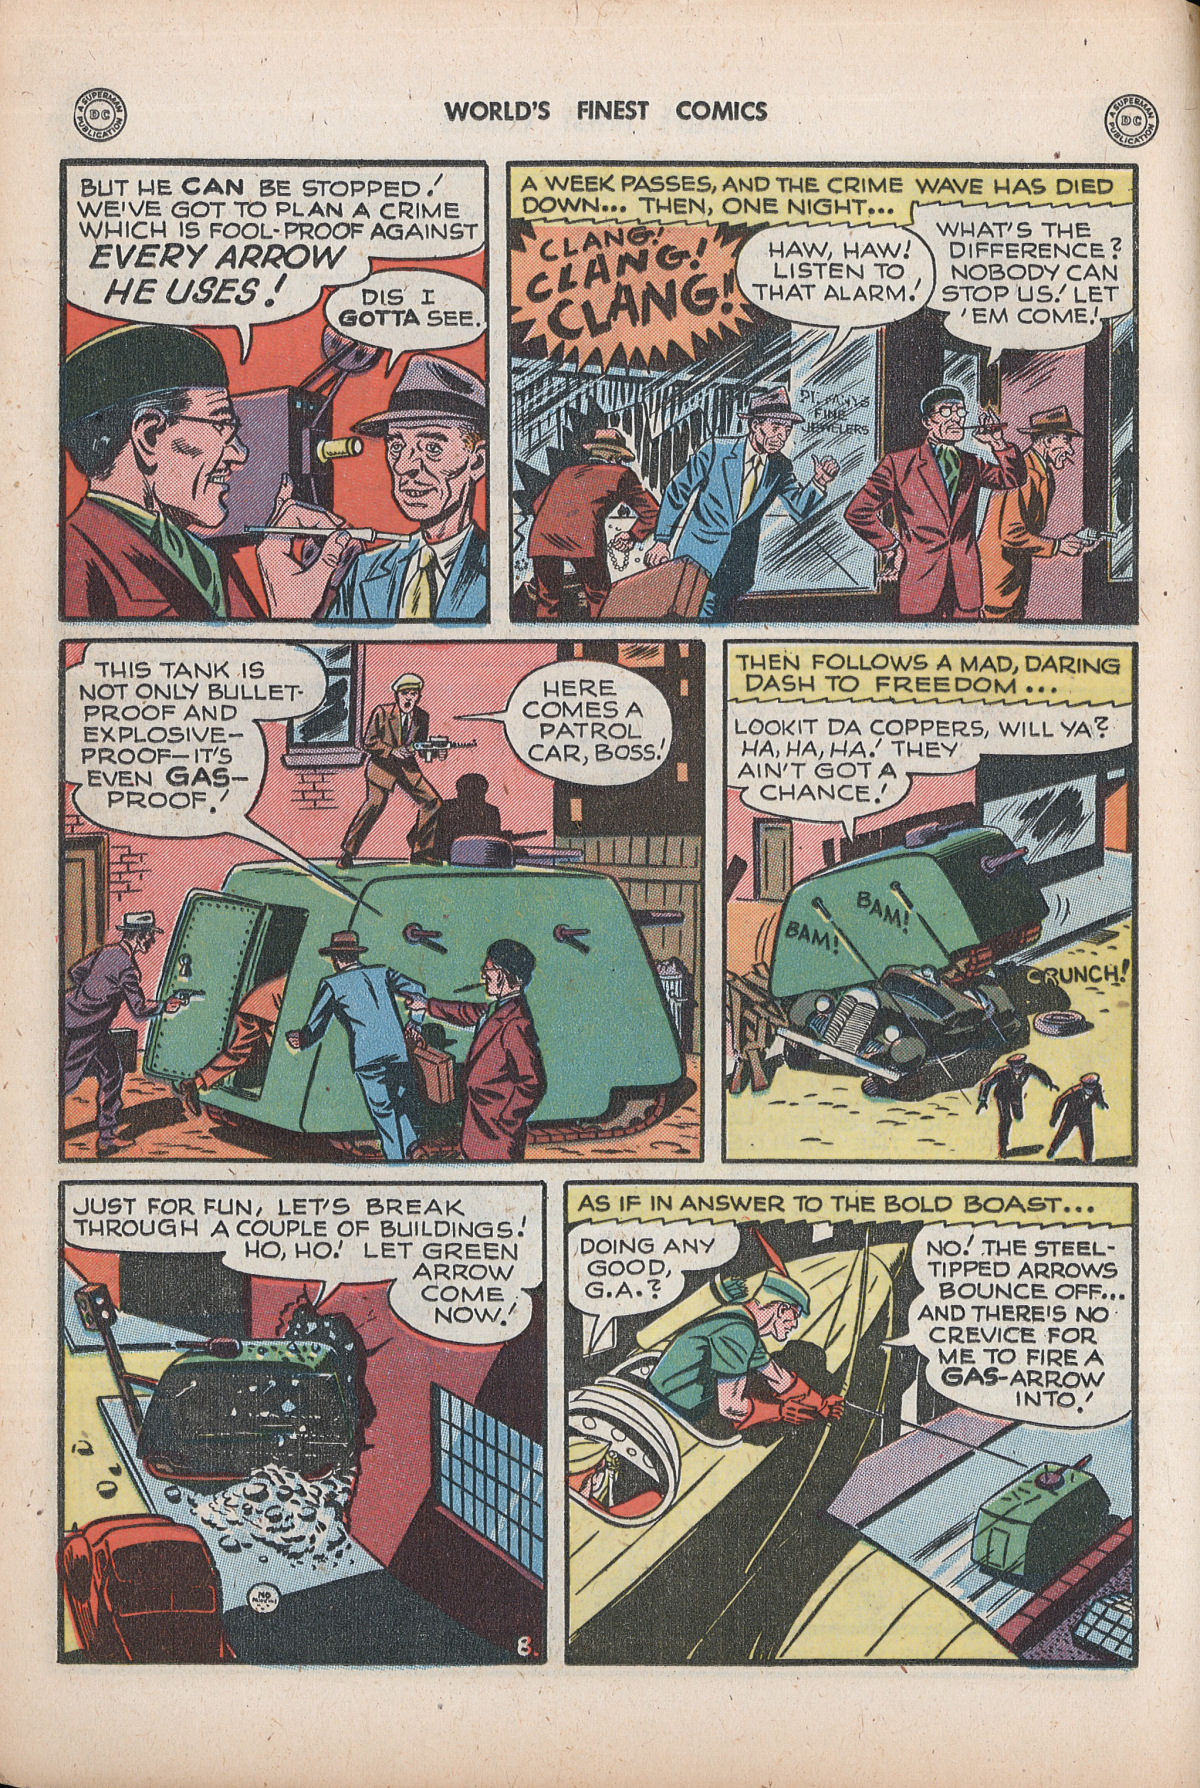 Read online World's Finest Comics comic -  Issue #32 - 24